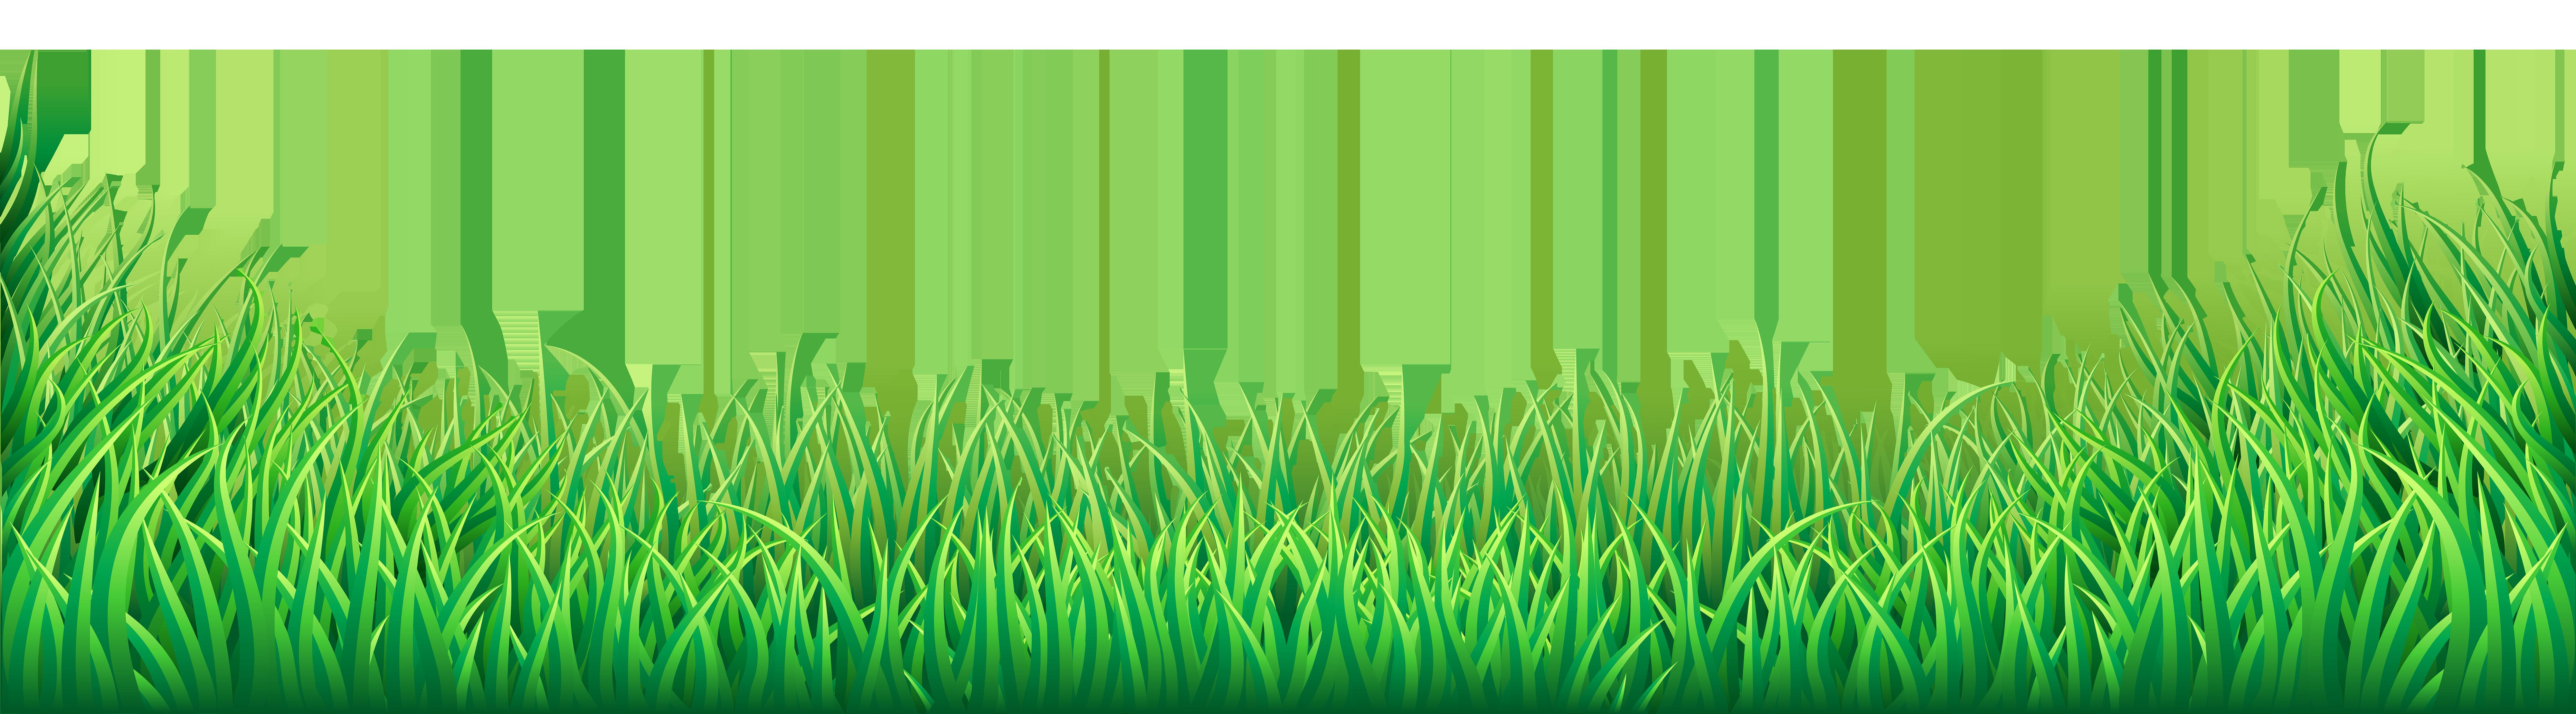 Lawn clip art png. Clipart grass translucent